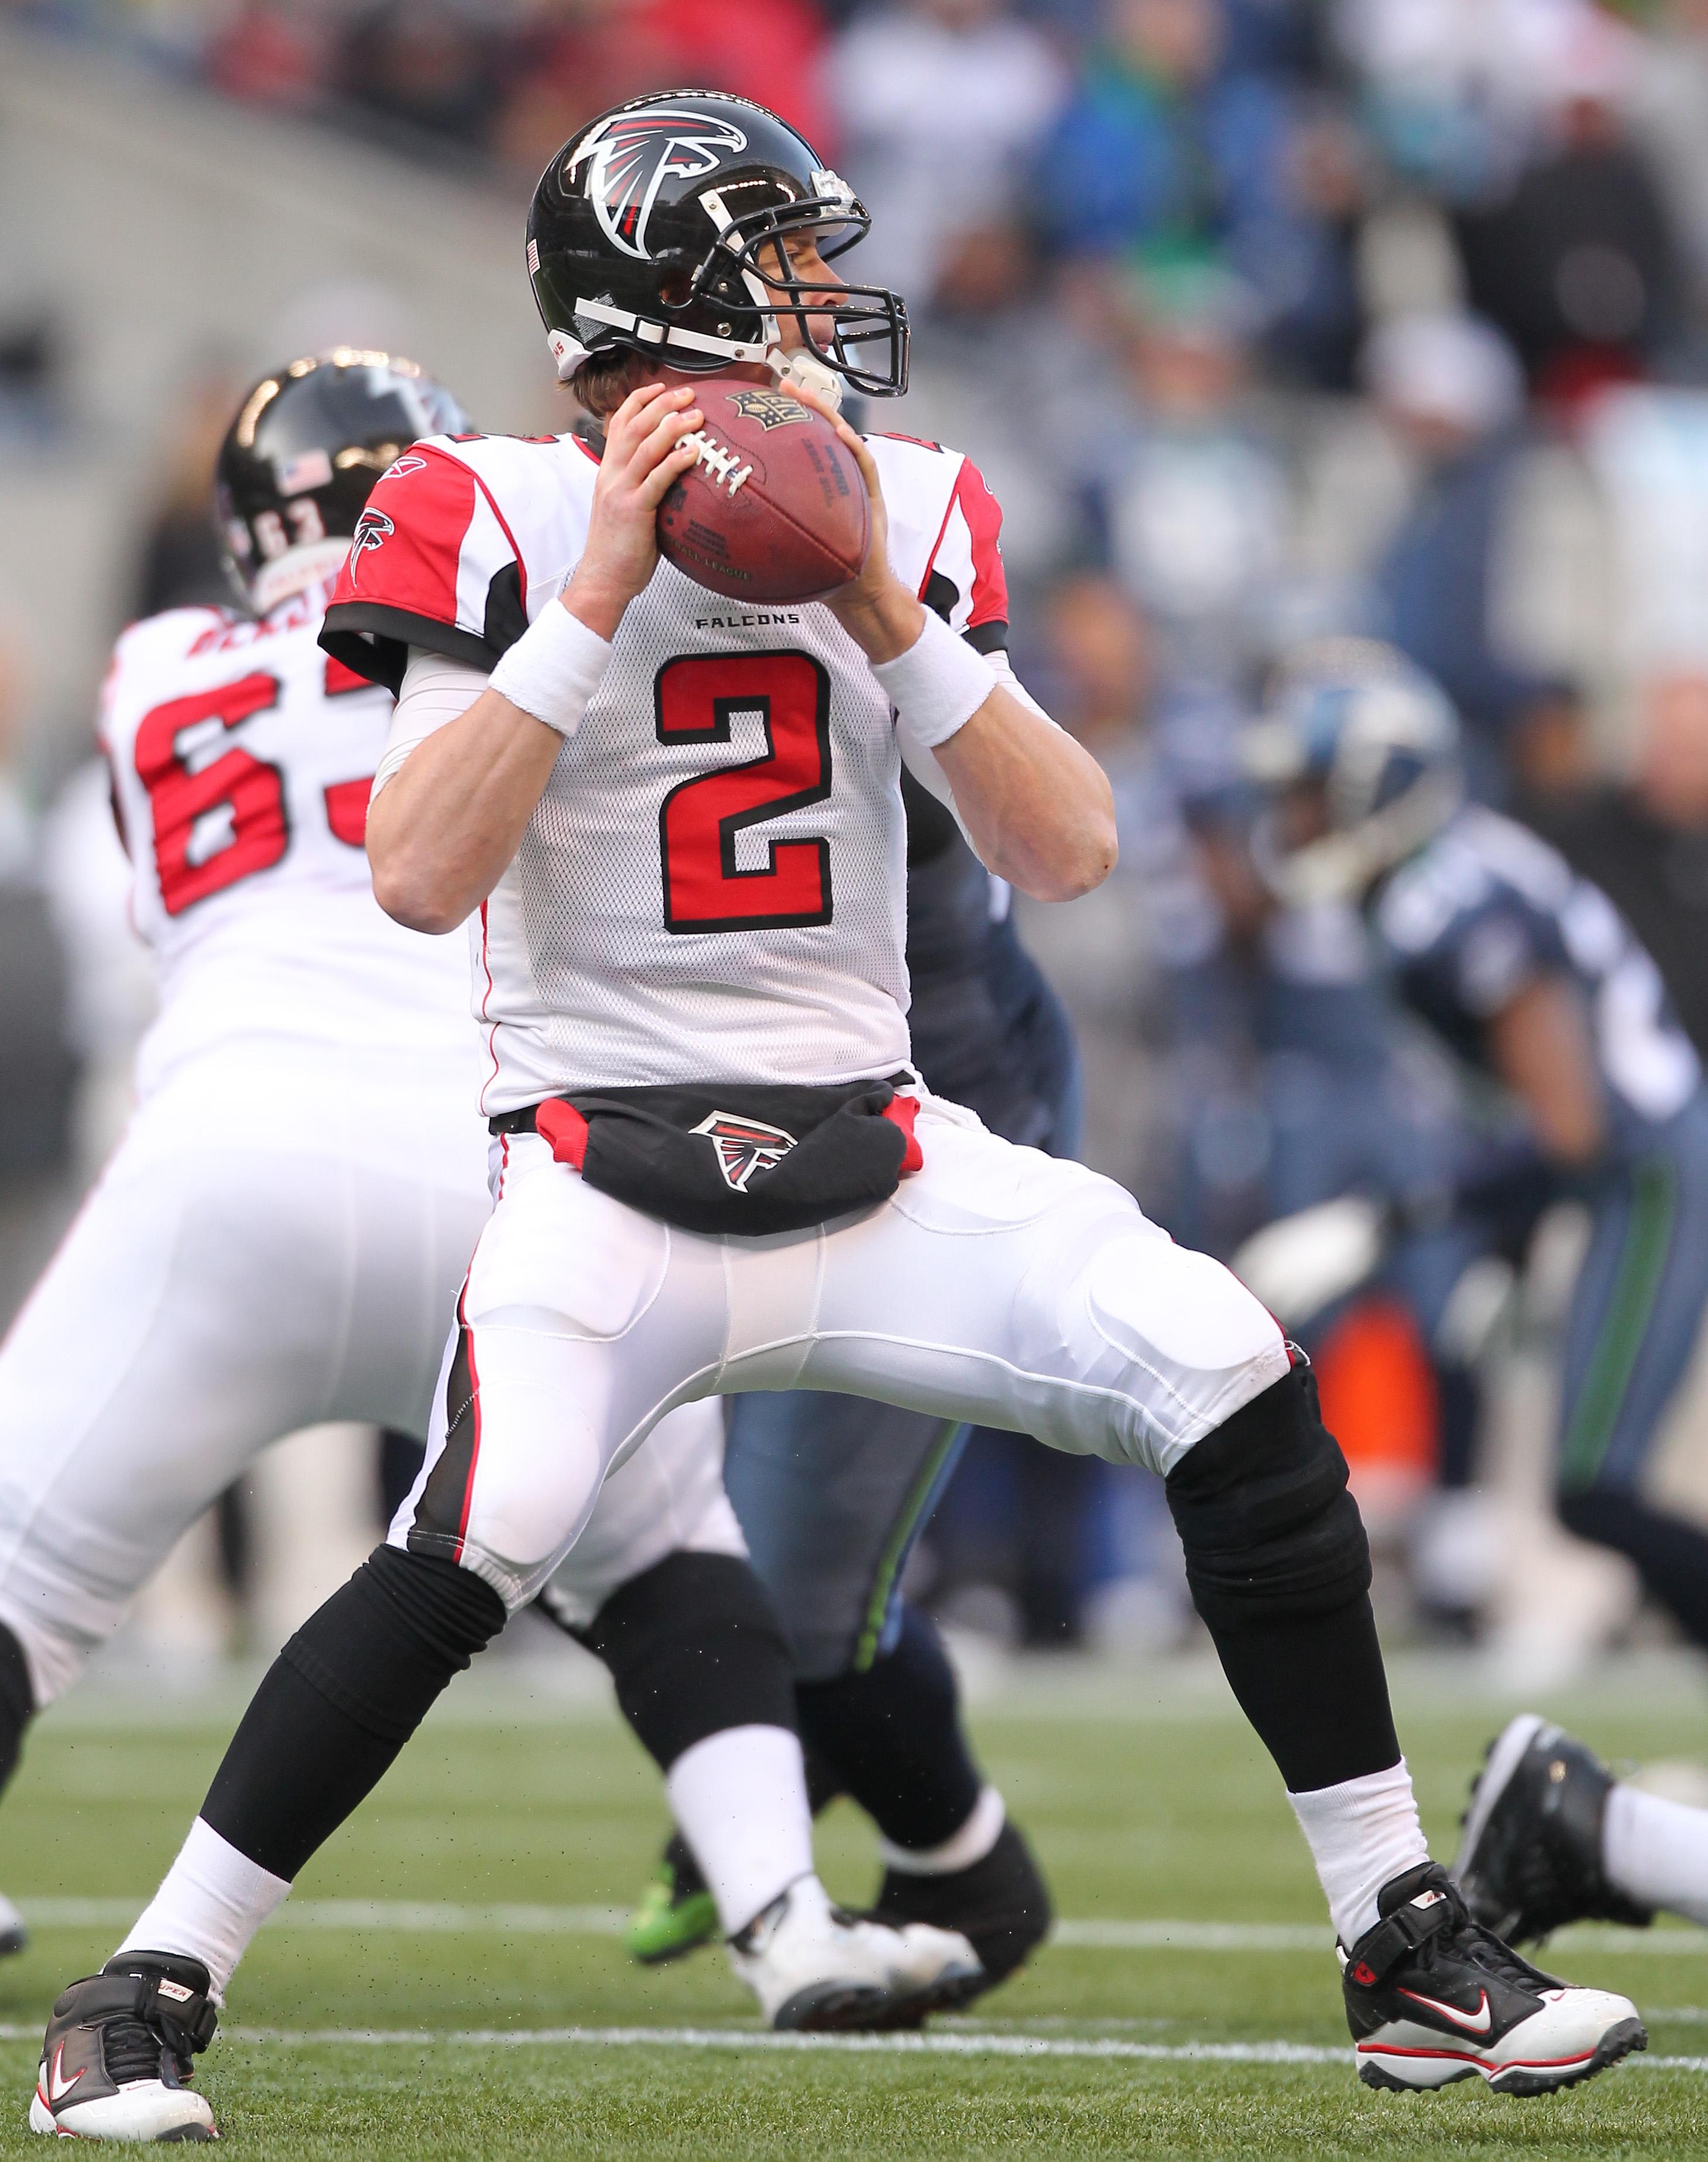 Ryan has the Falcons thinking Super Bowl.